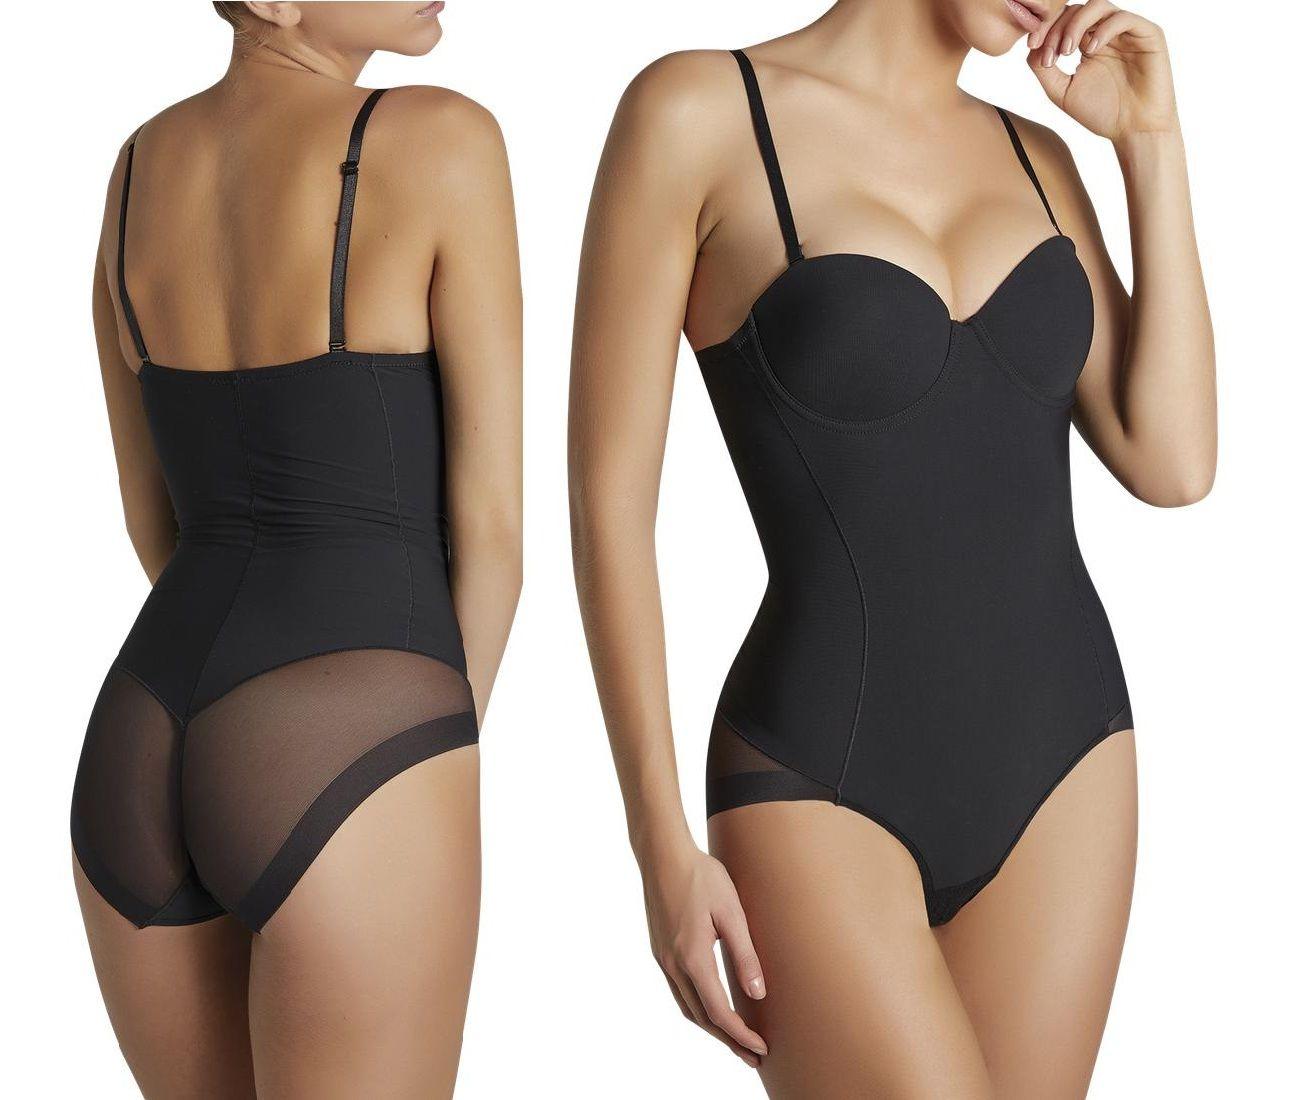 9742301f121 2019 Amazon Hot Selling Ladies Full Body Shaper Padded Bra Bodysuit Open  Crotch Corset Slimming Shaper From Critylin